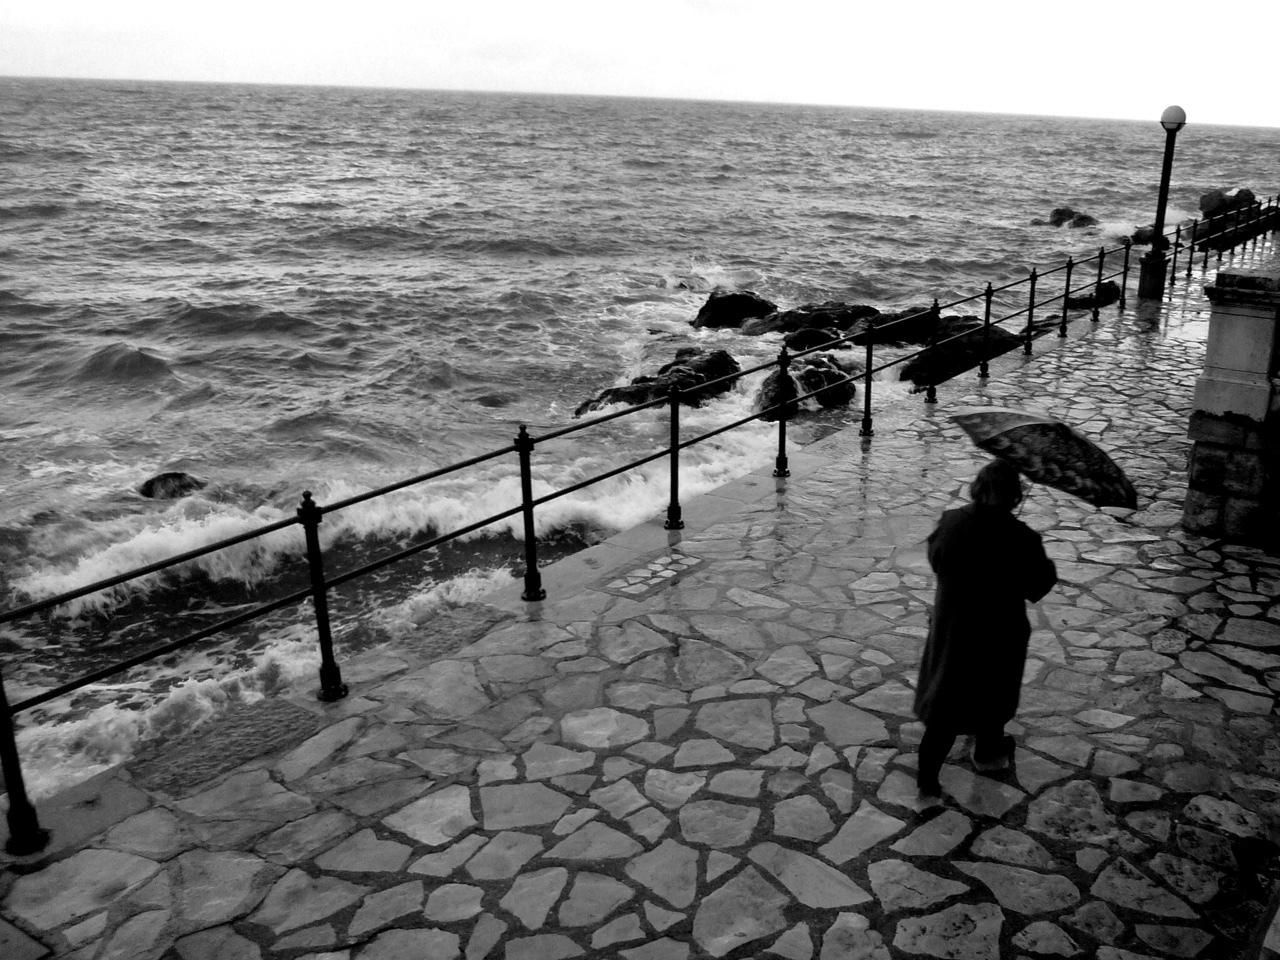 Luka, Marotti, lived, through, frames, proživljeni, kadar, izložba, exhibition, Mimara